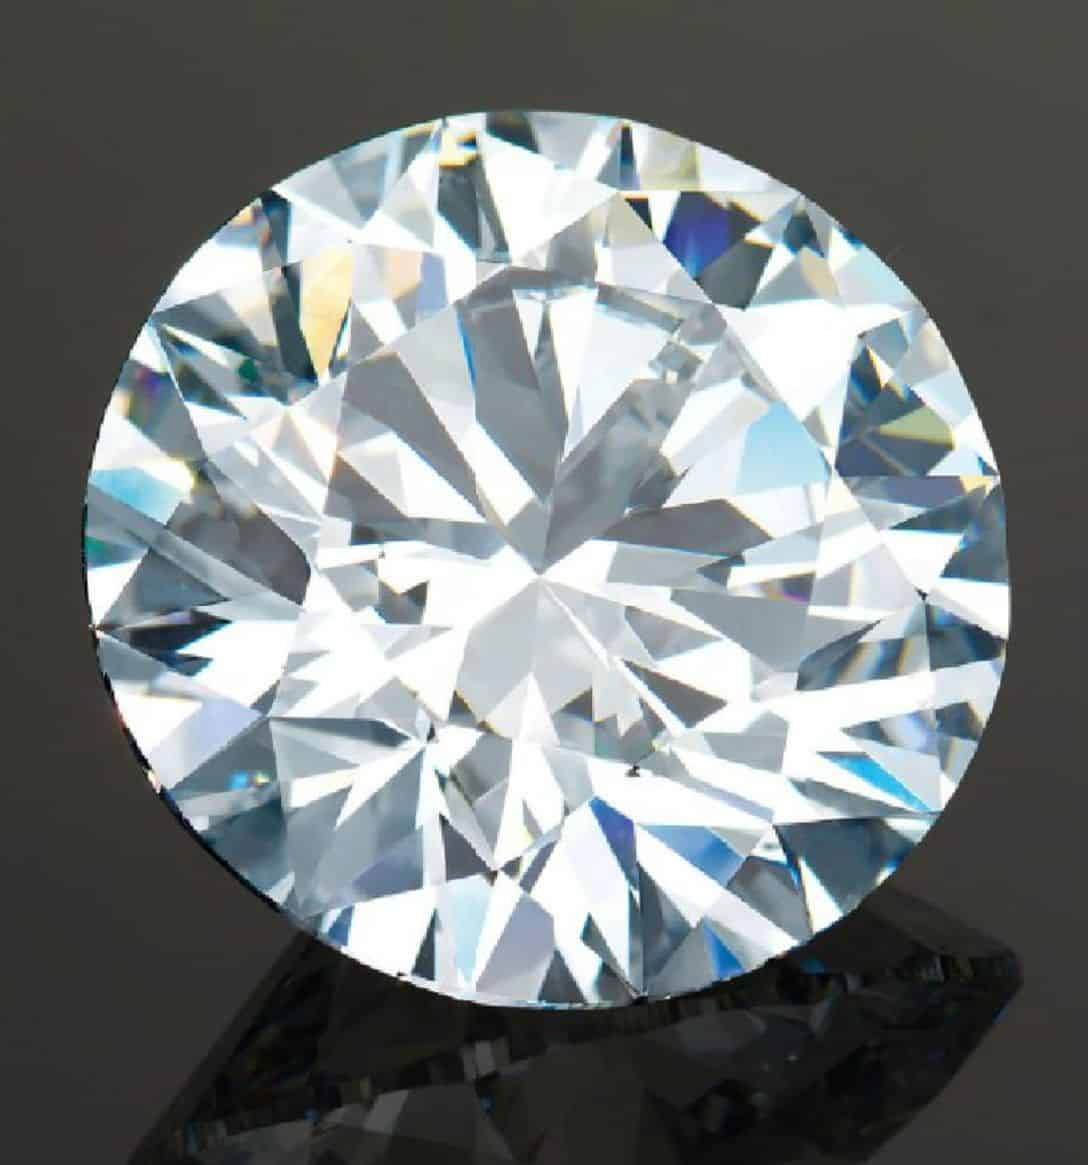 LOT 2075 - AN UNMOUNTED DIAMOND